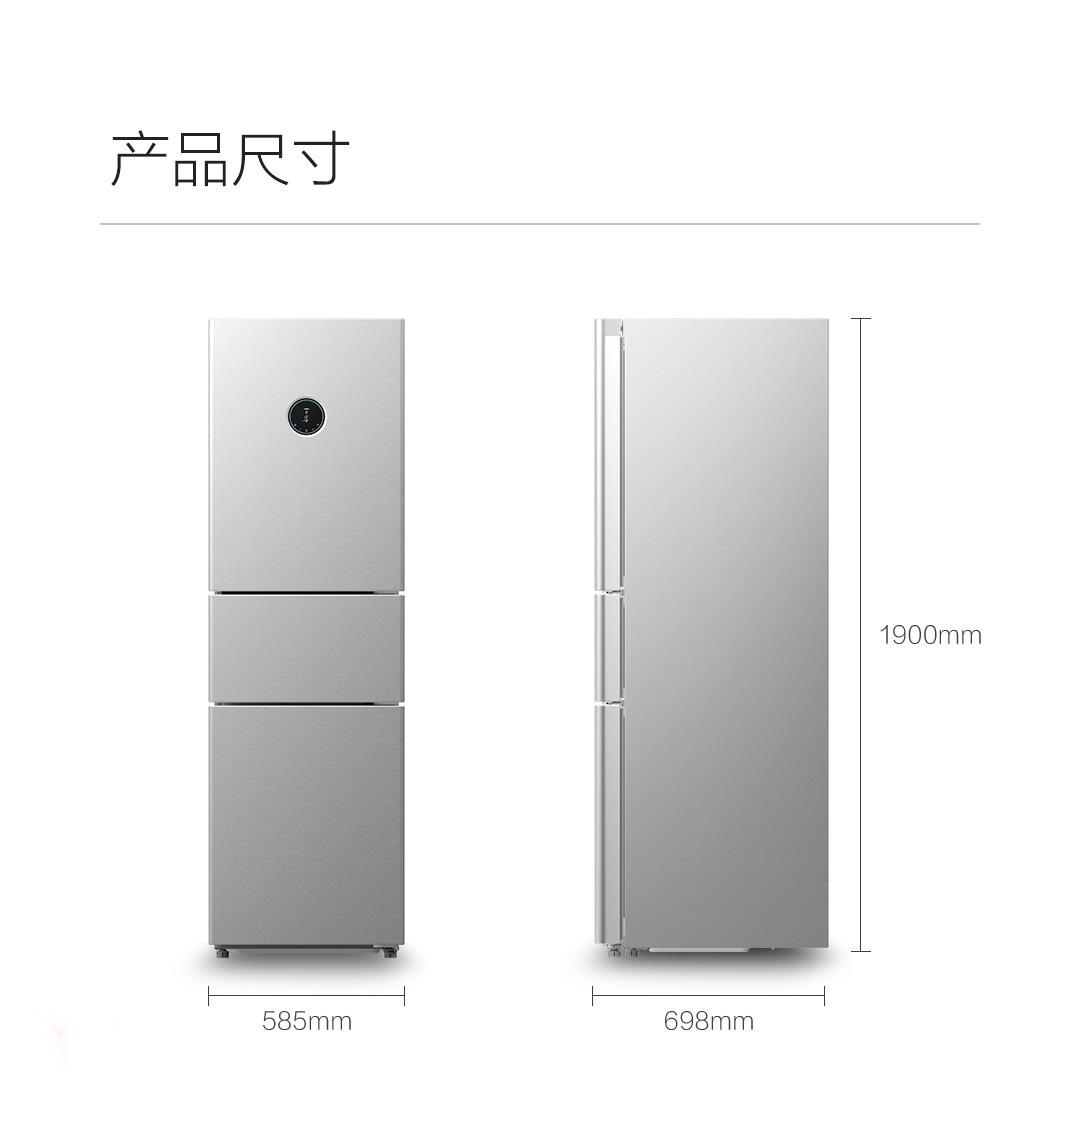 Xiaomi Yunmi Smart Refrigerator 301L, the new smart refrigerator